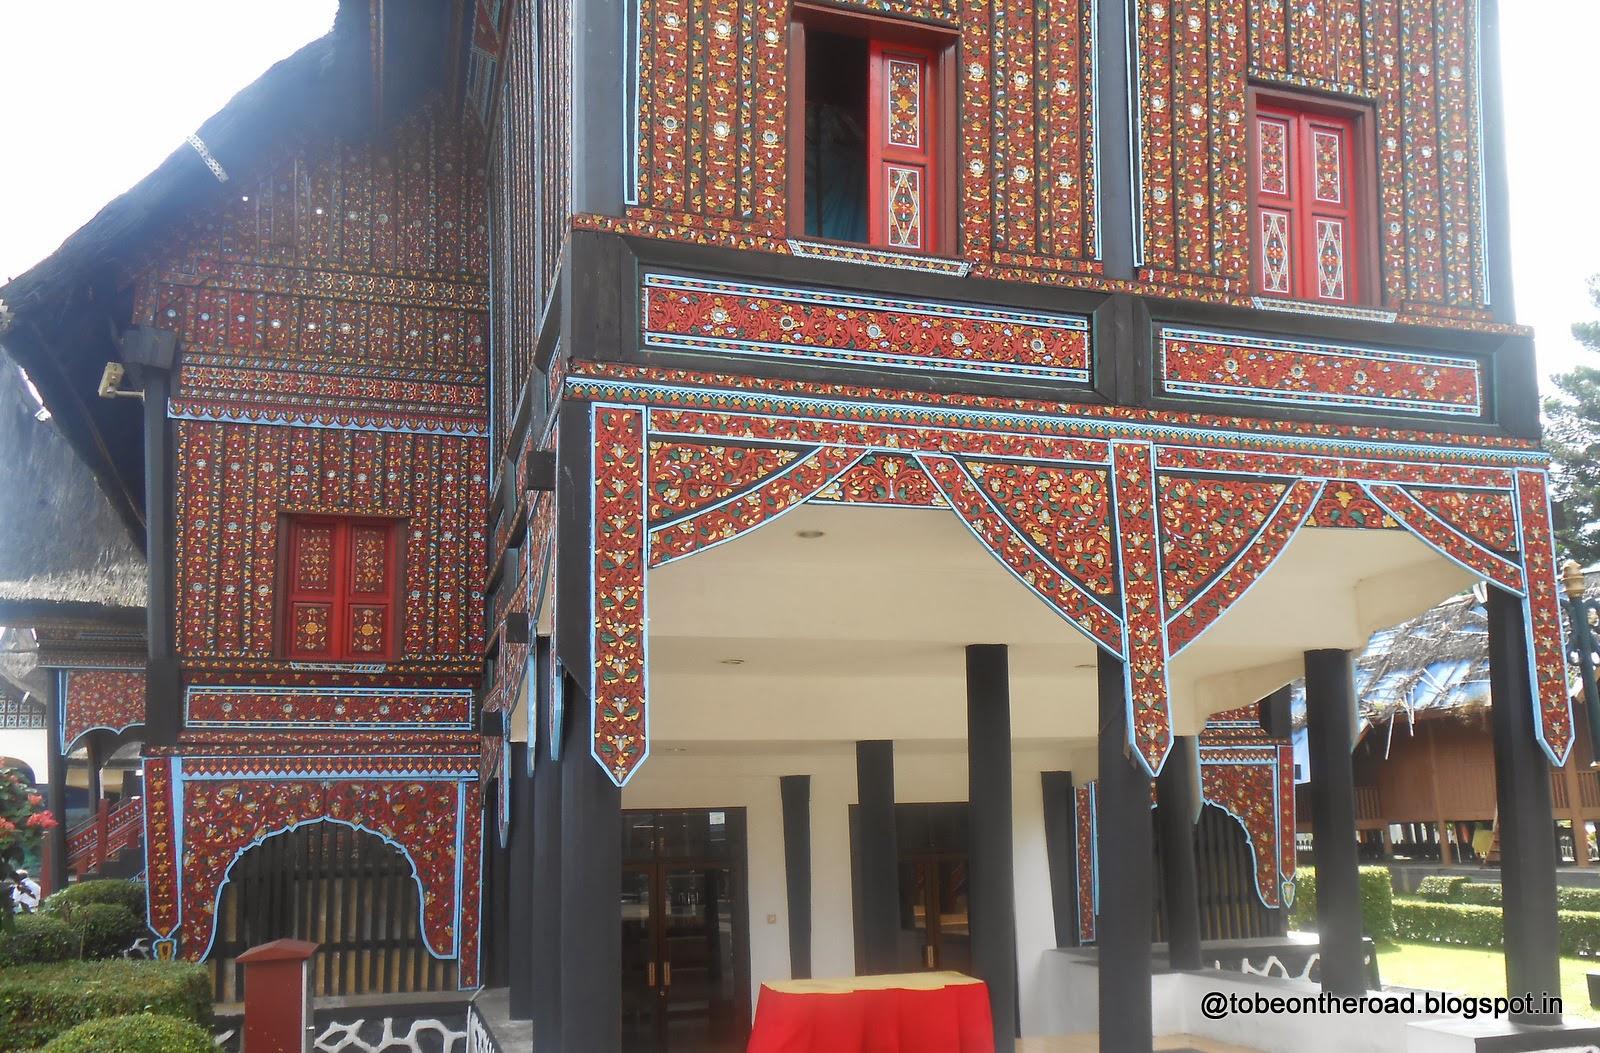 Indonesia,Jakarta,Taman Mini,Province Houses